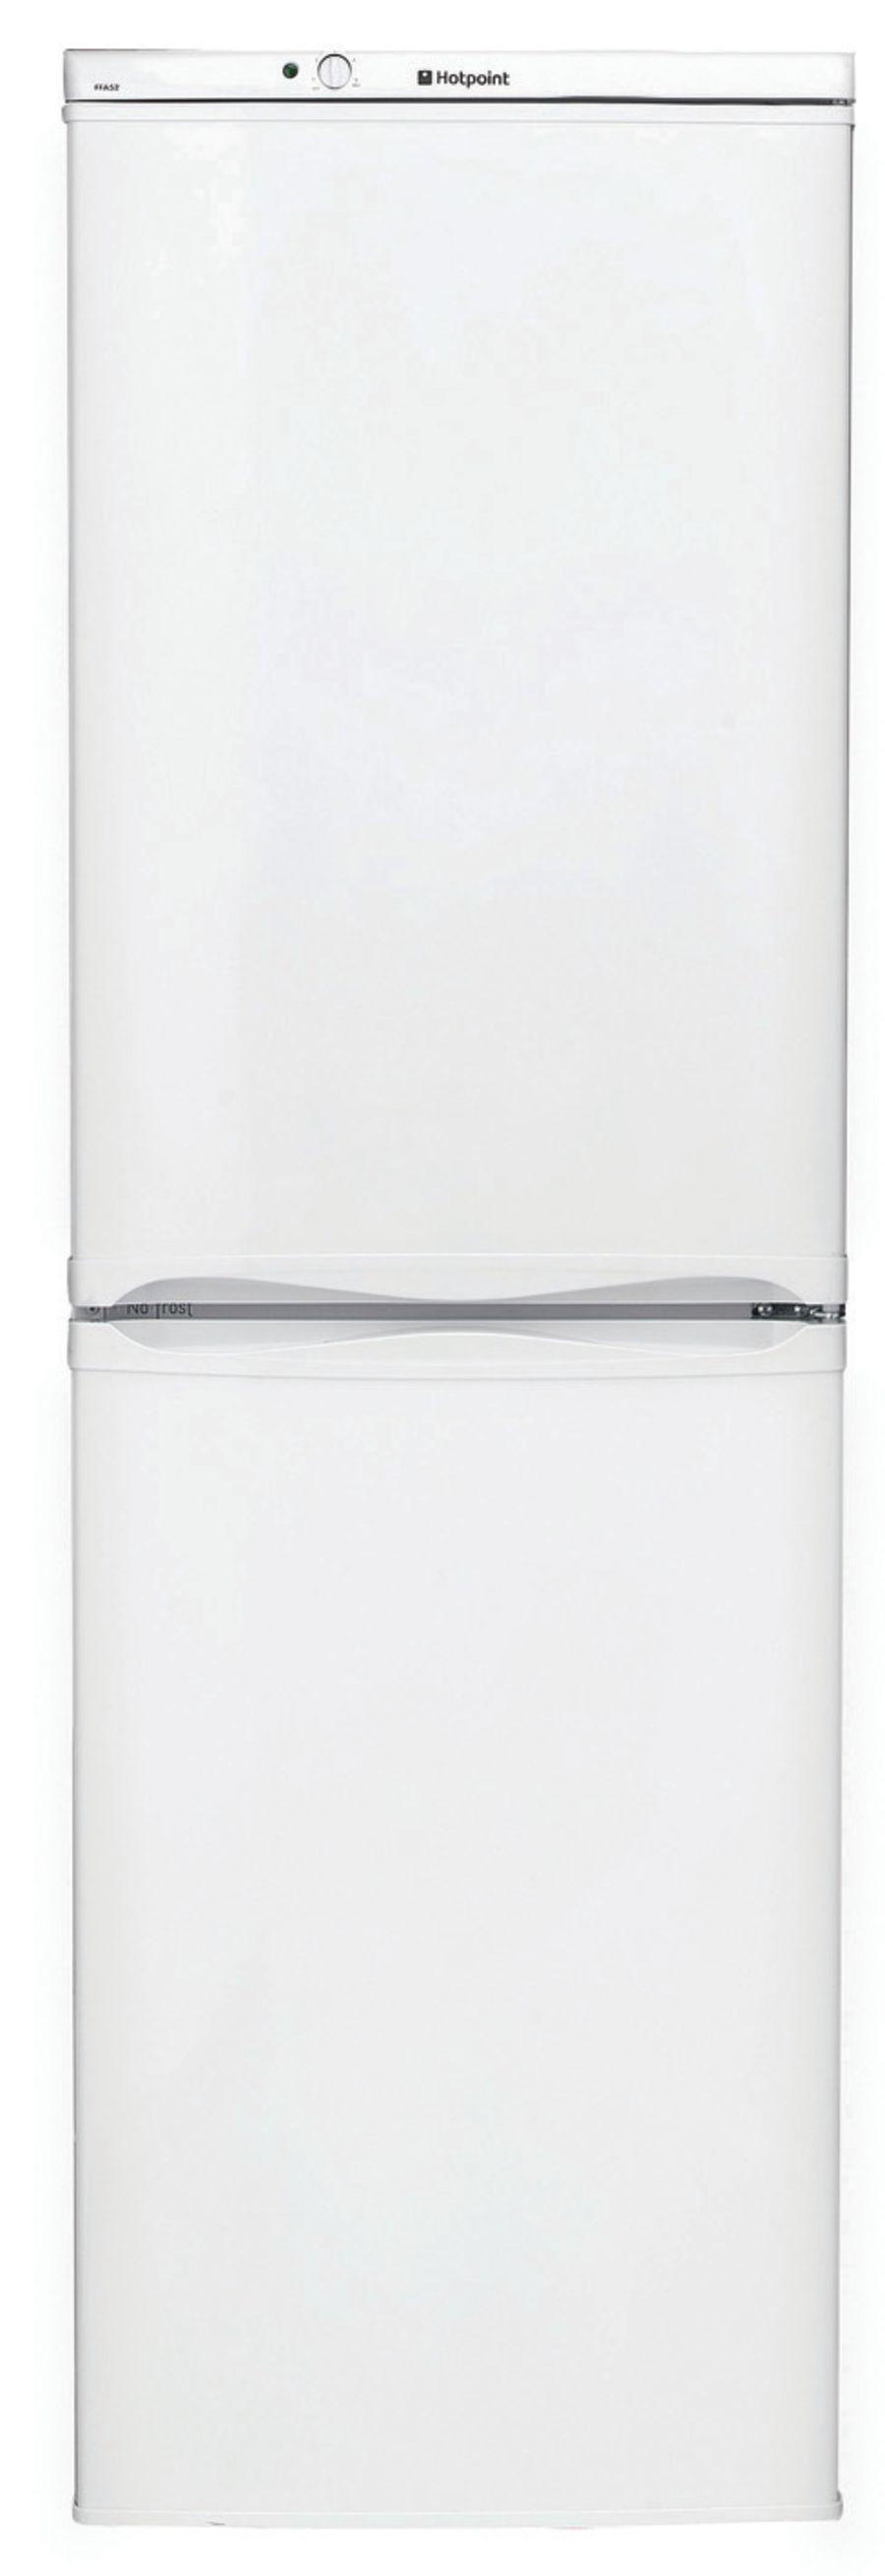 Hotpoint White Frost Free Fridge Freezer HBNF5517W